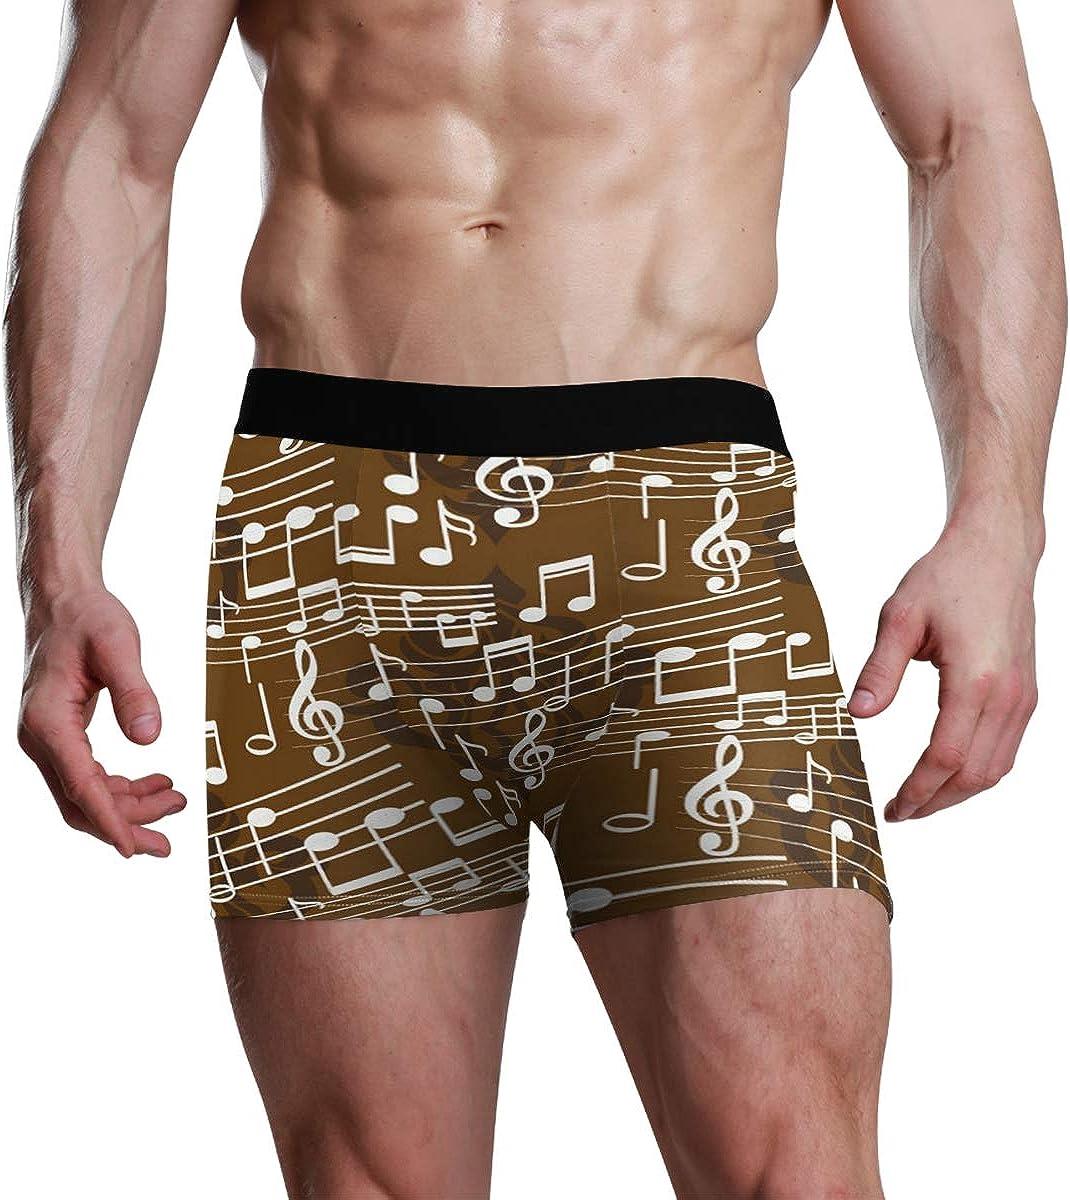 HangWang Mens Underwear Briefs Endless Abstract Pattern Breathable Long Boxer Briefs Underwear Boys